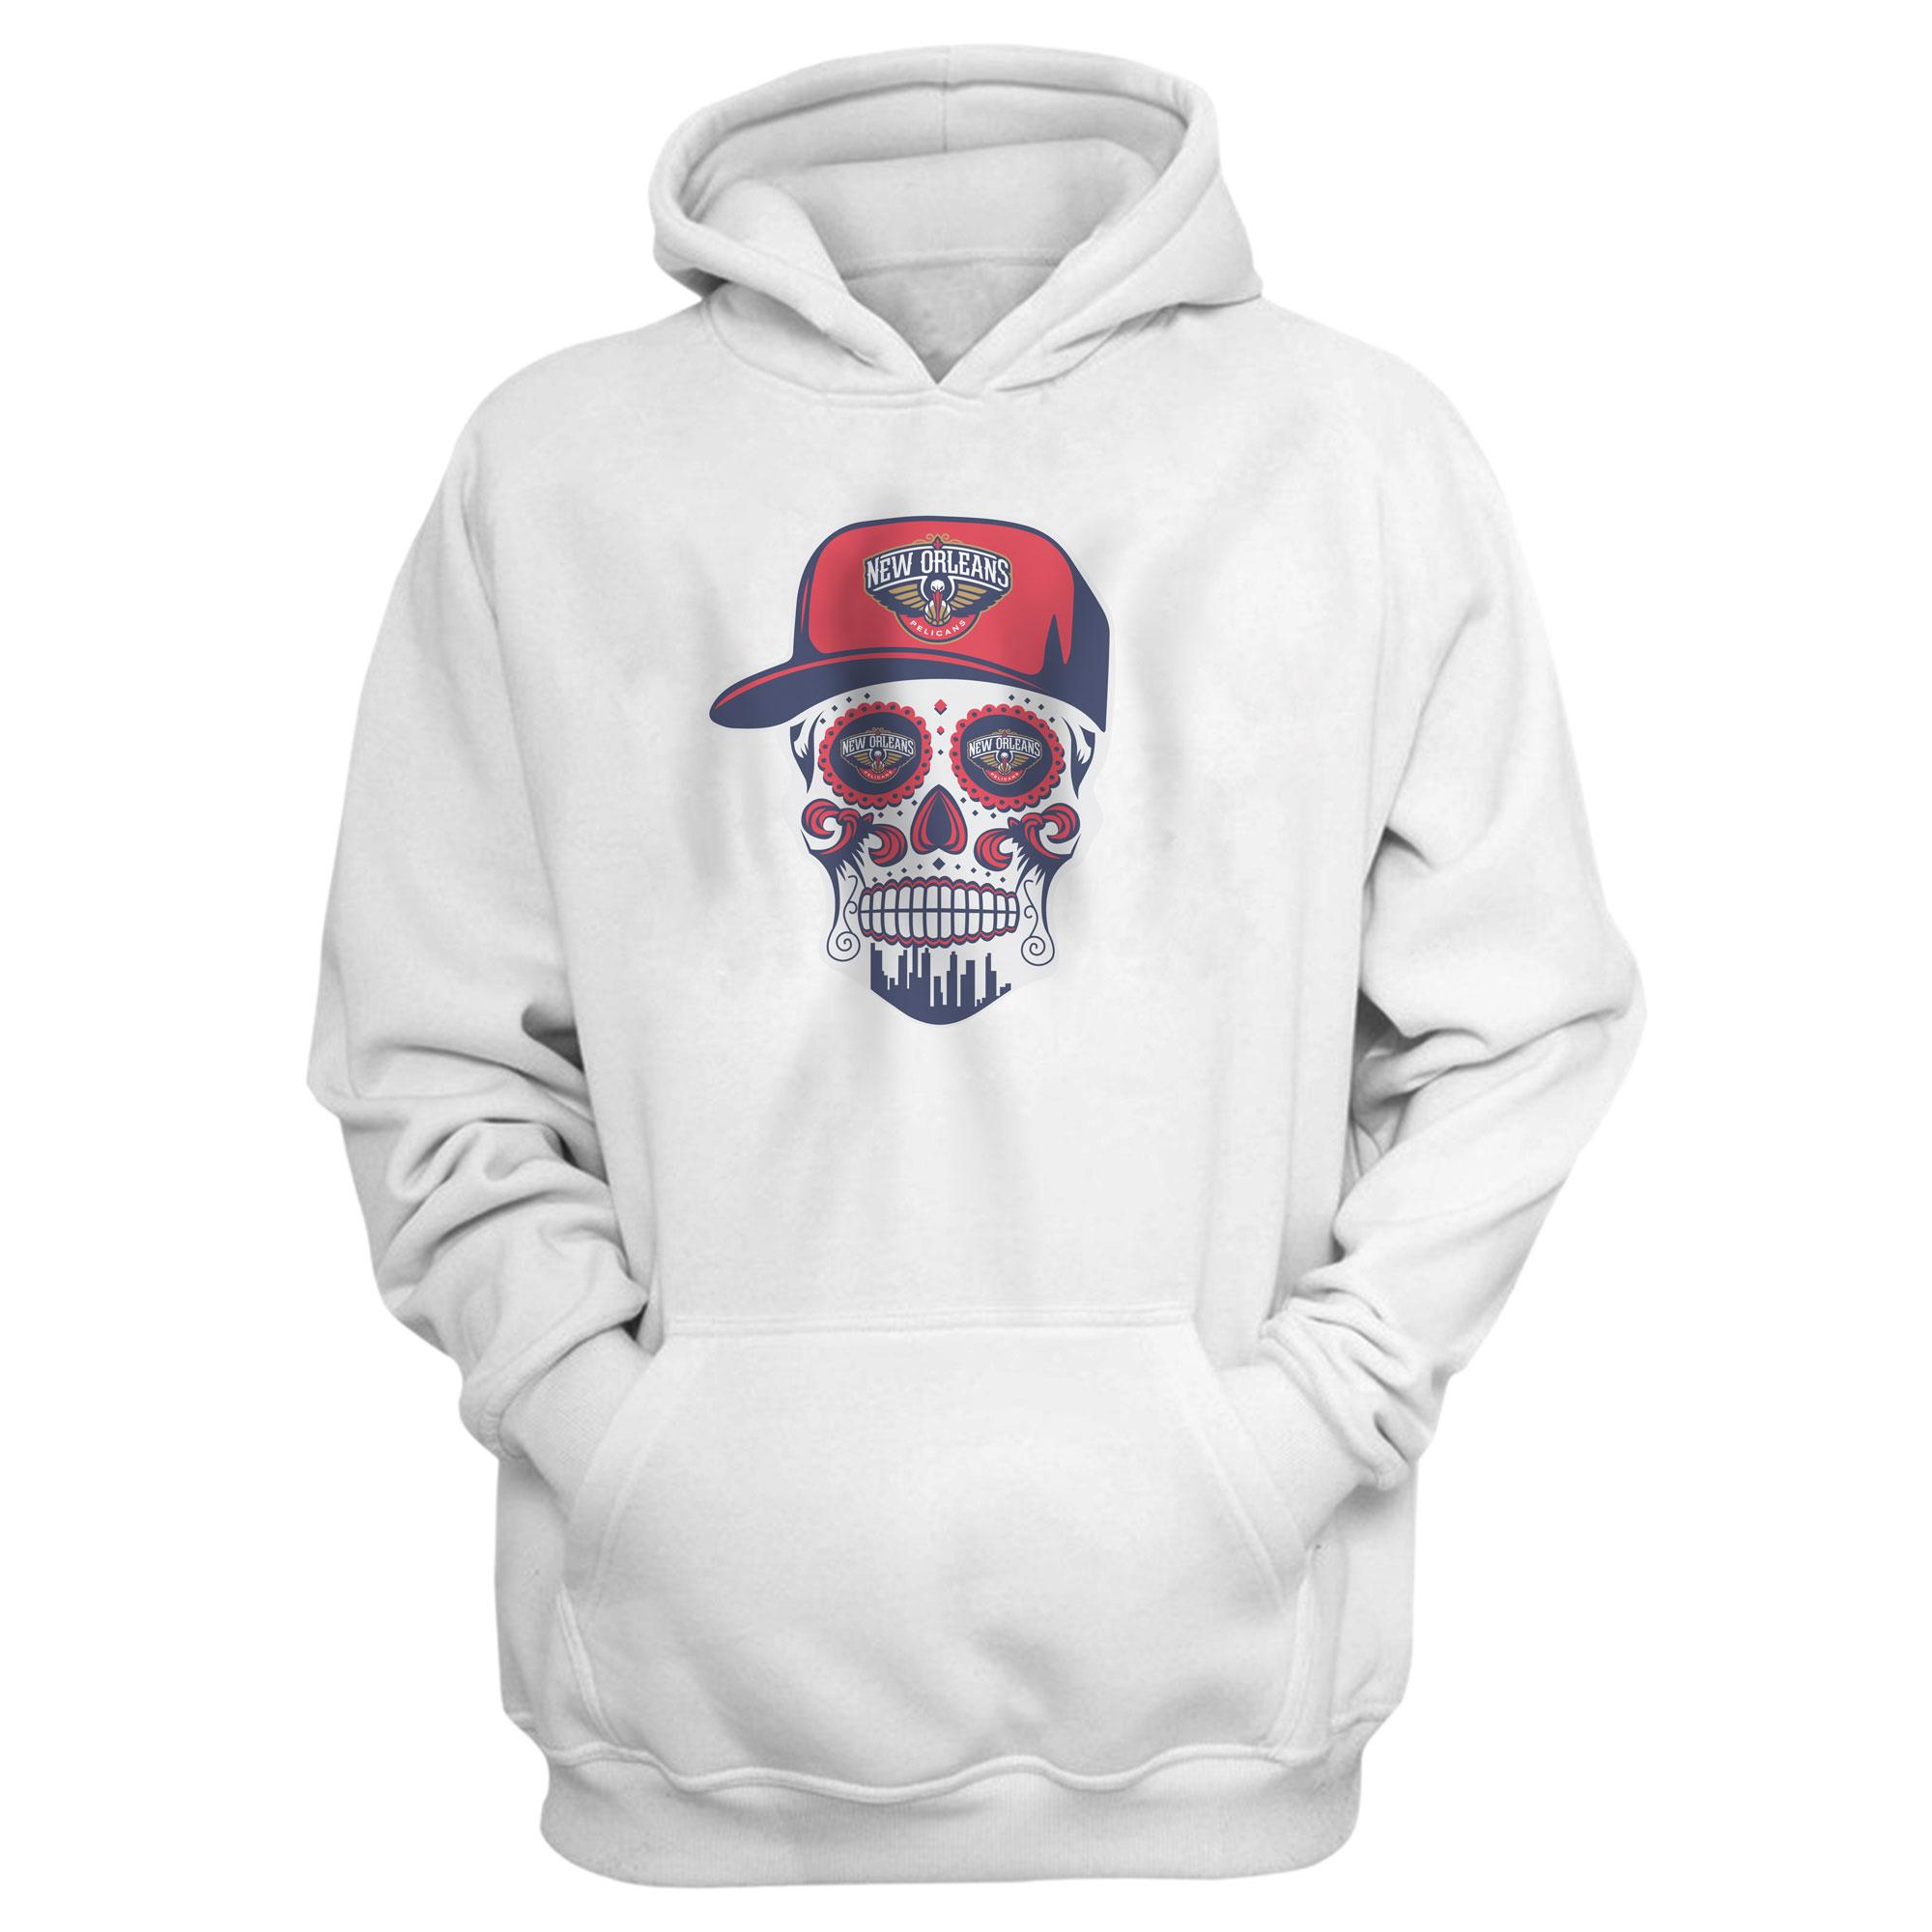 Pelicans Skull Hoodie (HD-WHT-NP-460-NBA-NOLA-SKULL)